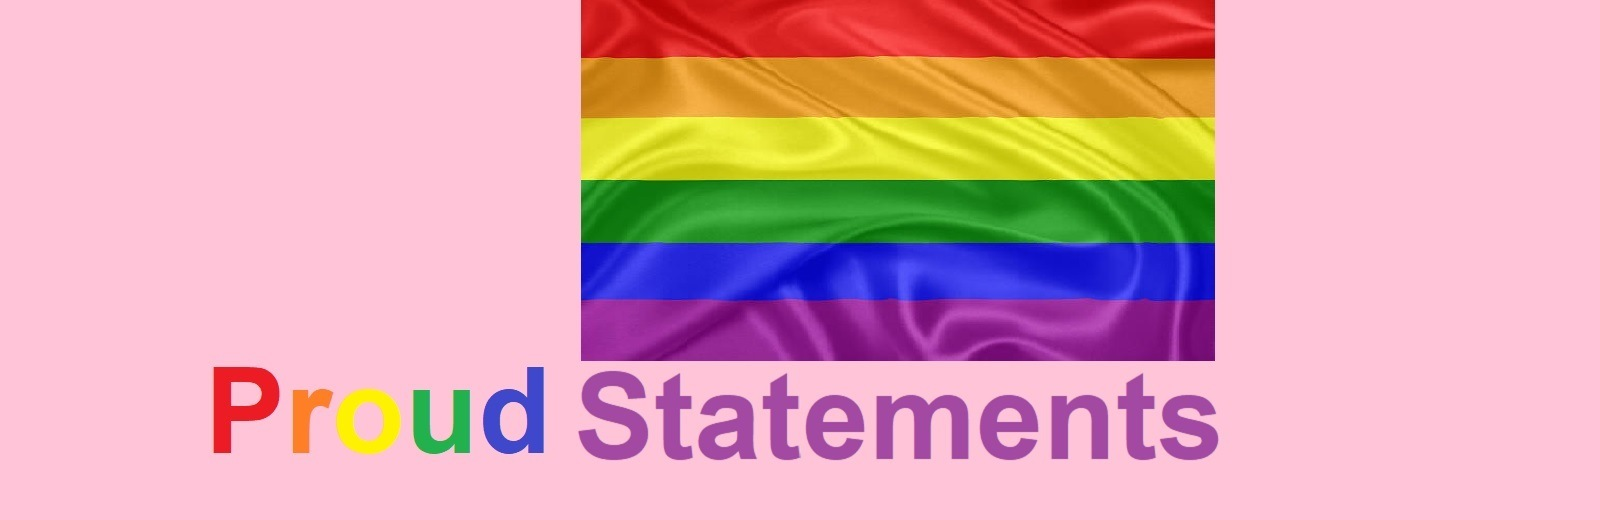 Proud Statements Store